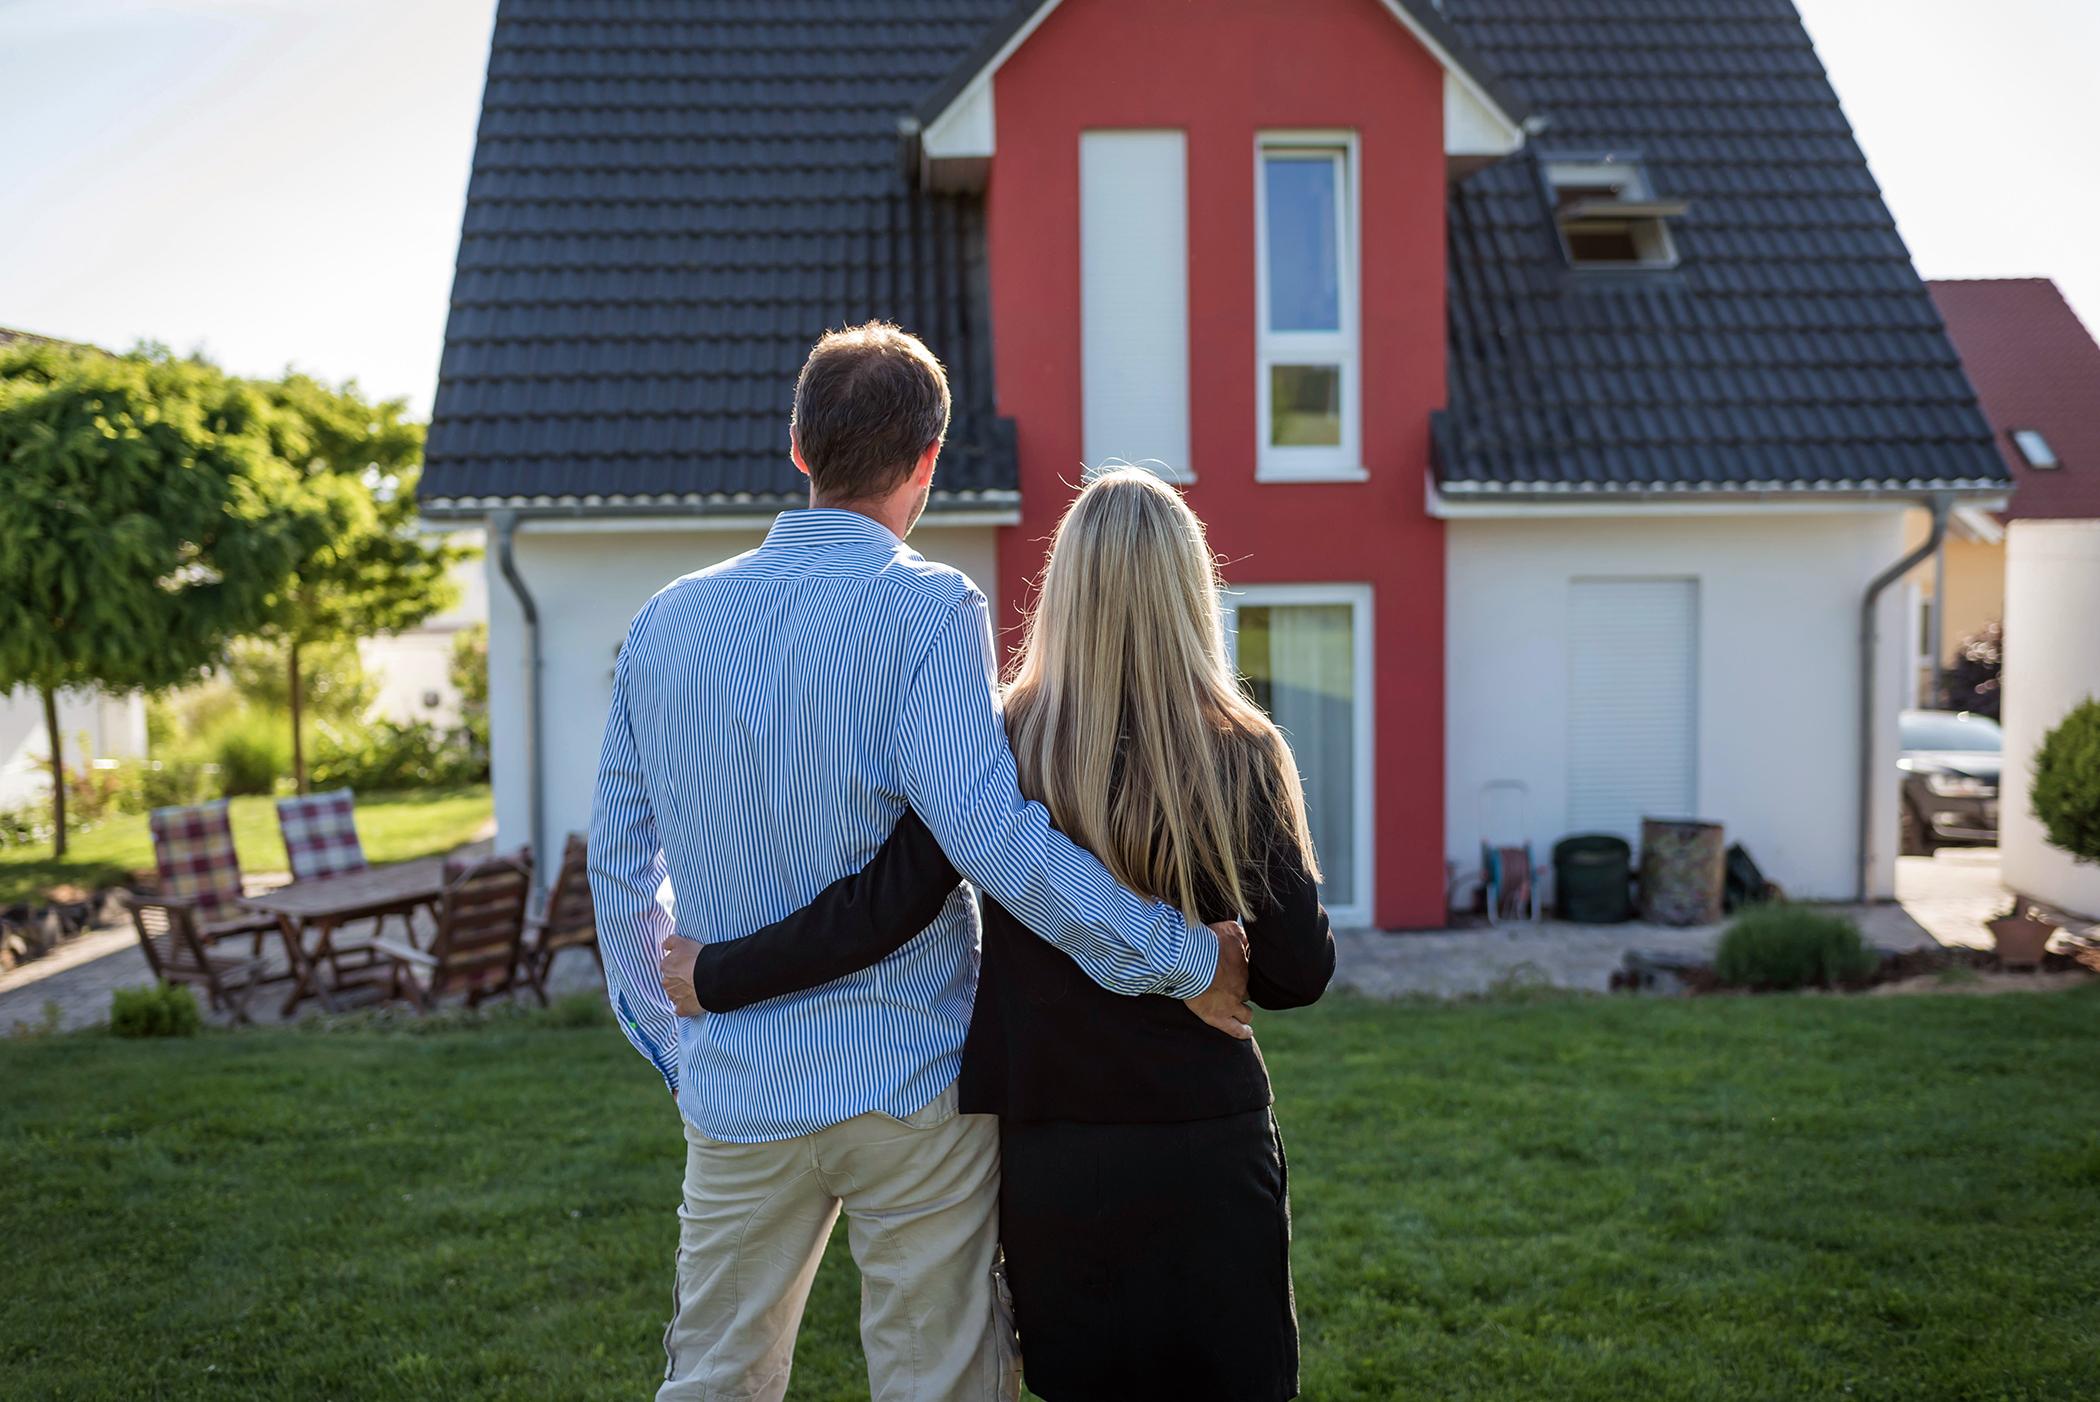 5 Benefits of Choosing Real Estate Property Online